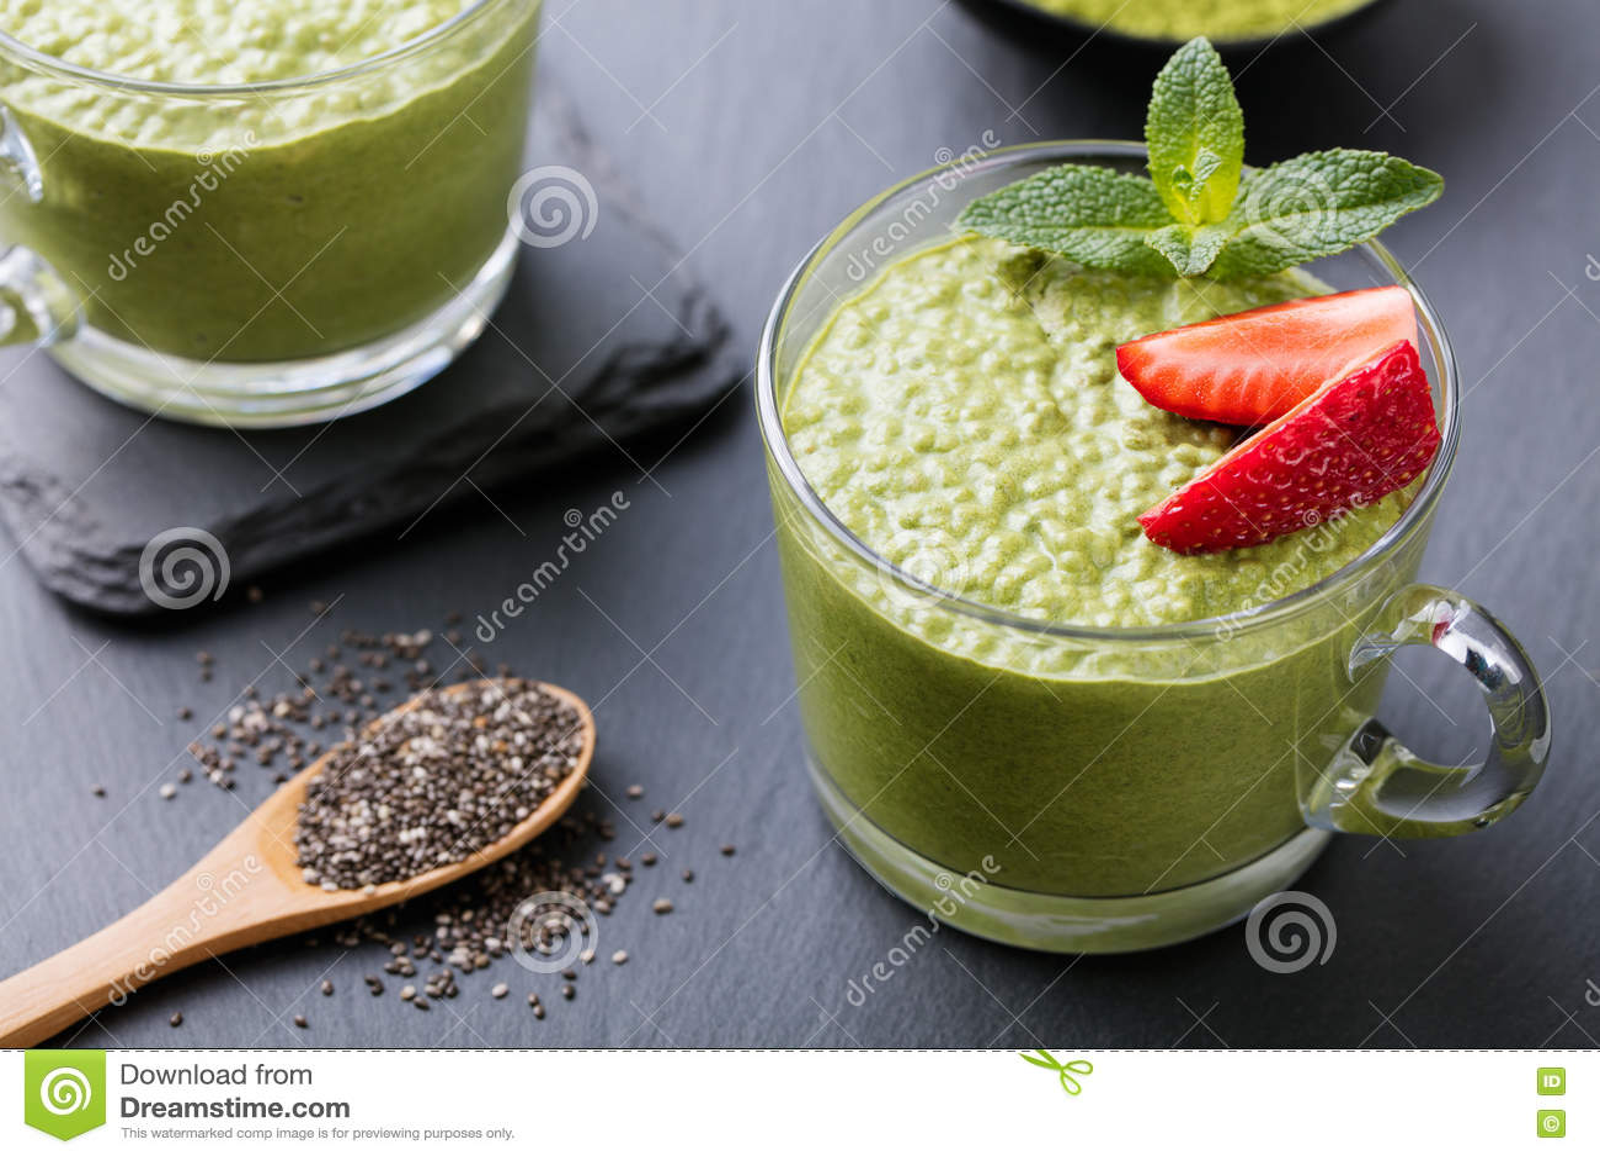 How to Make Matcha Green Tea Chia Pudding forecasting